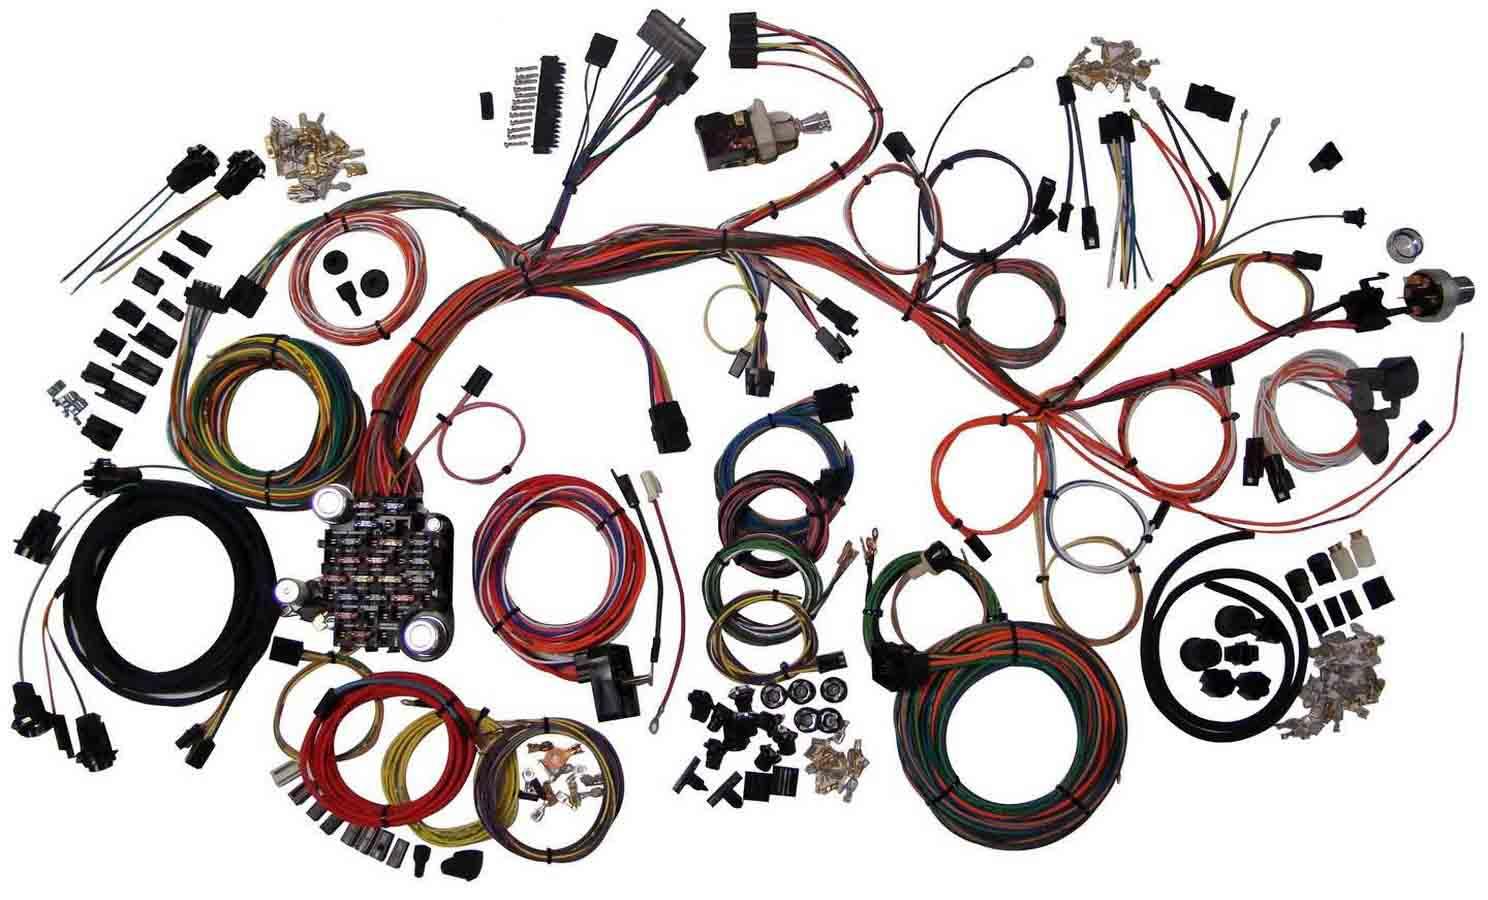 hight resolution of 61 64 impala wiring harness